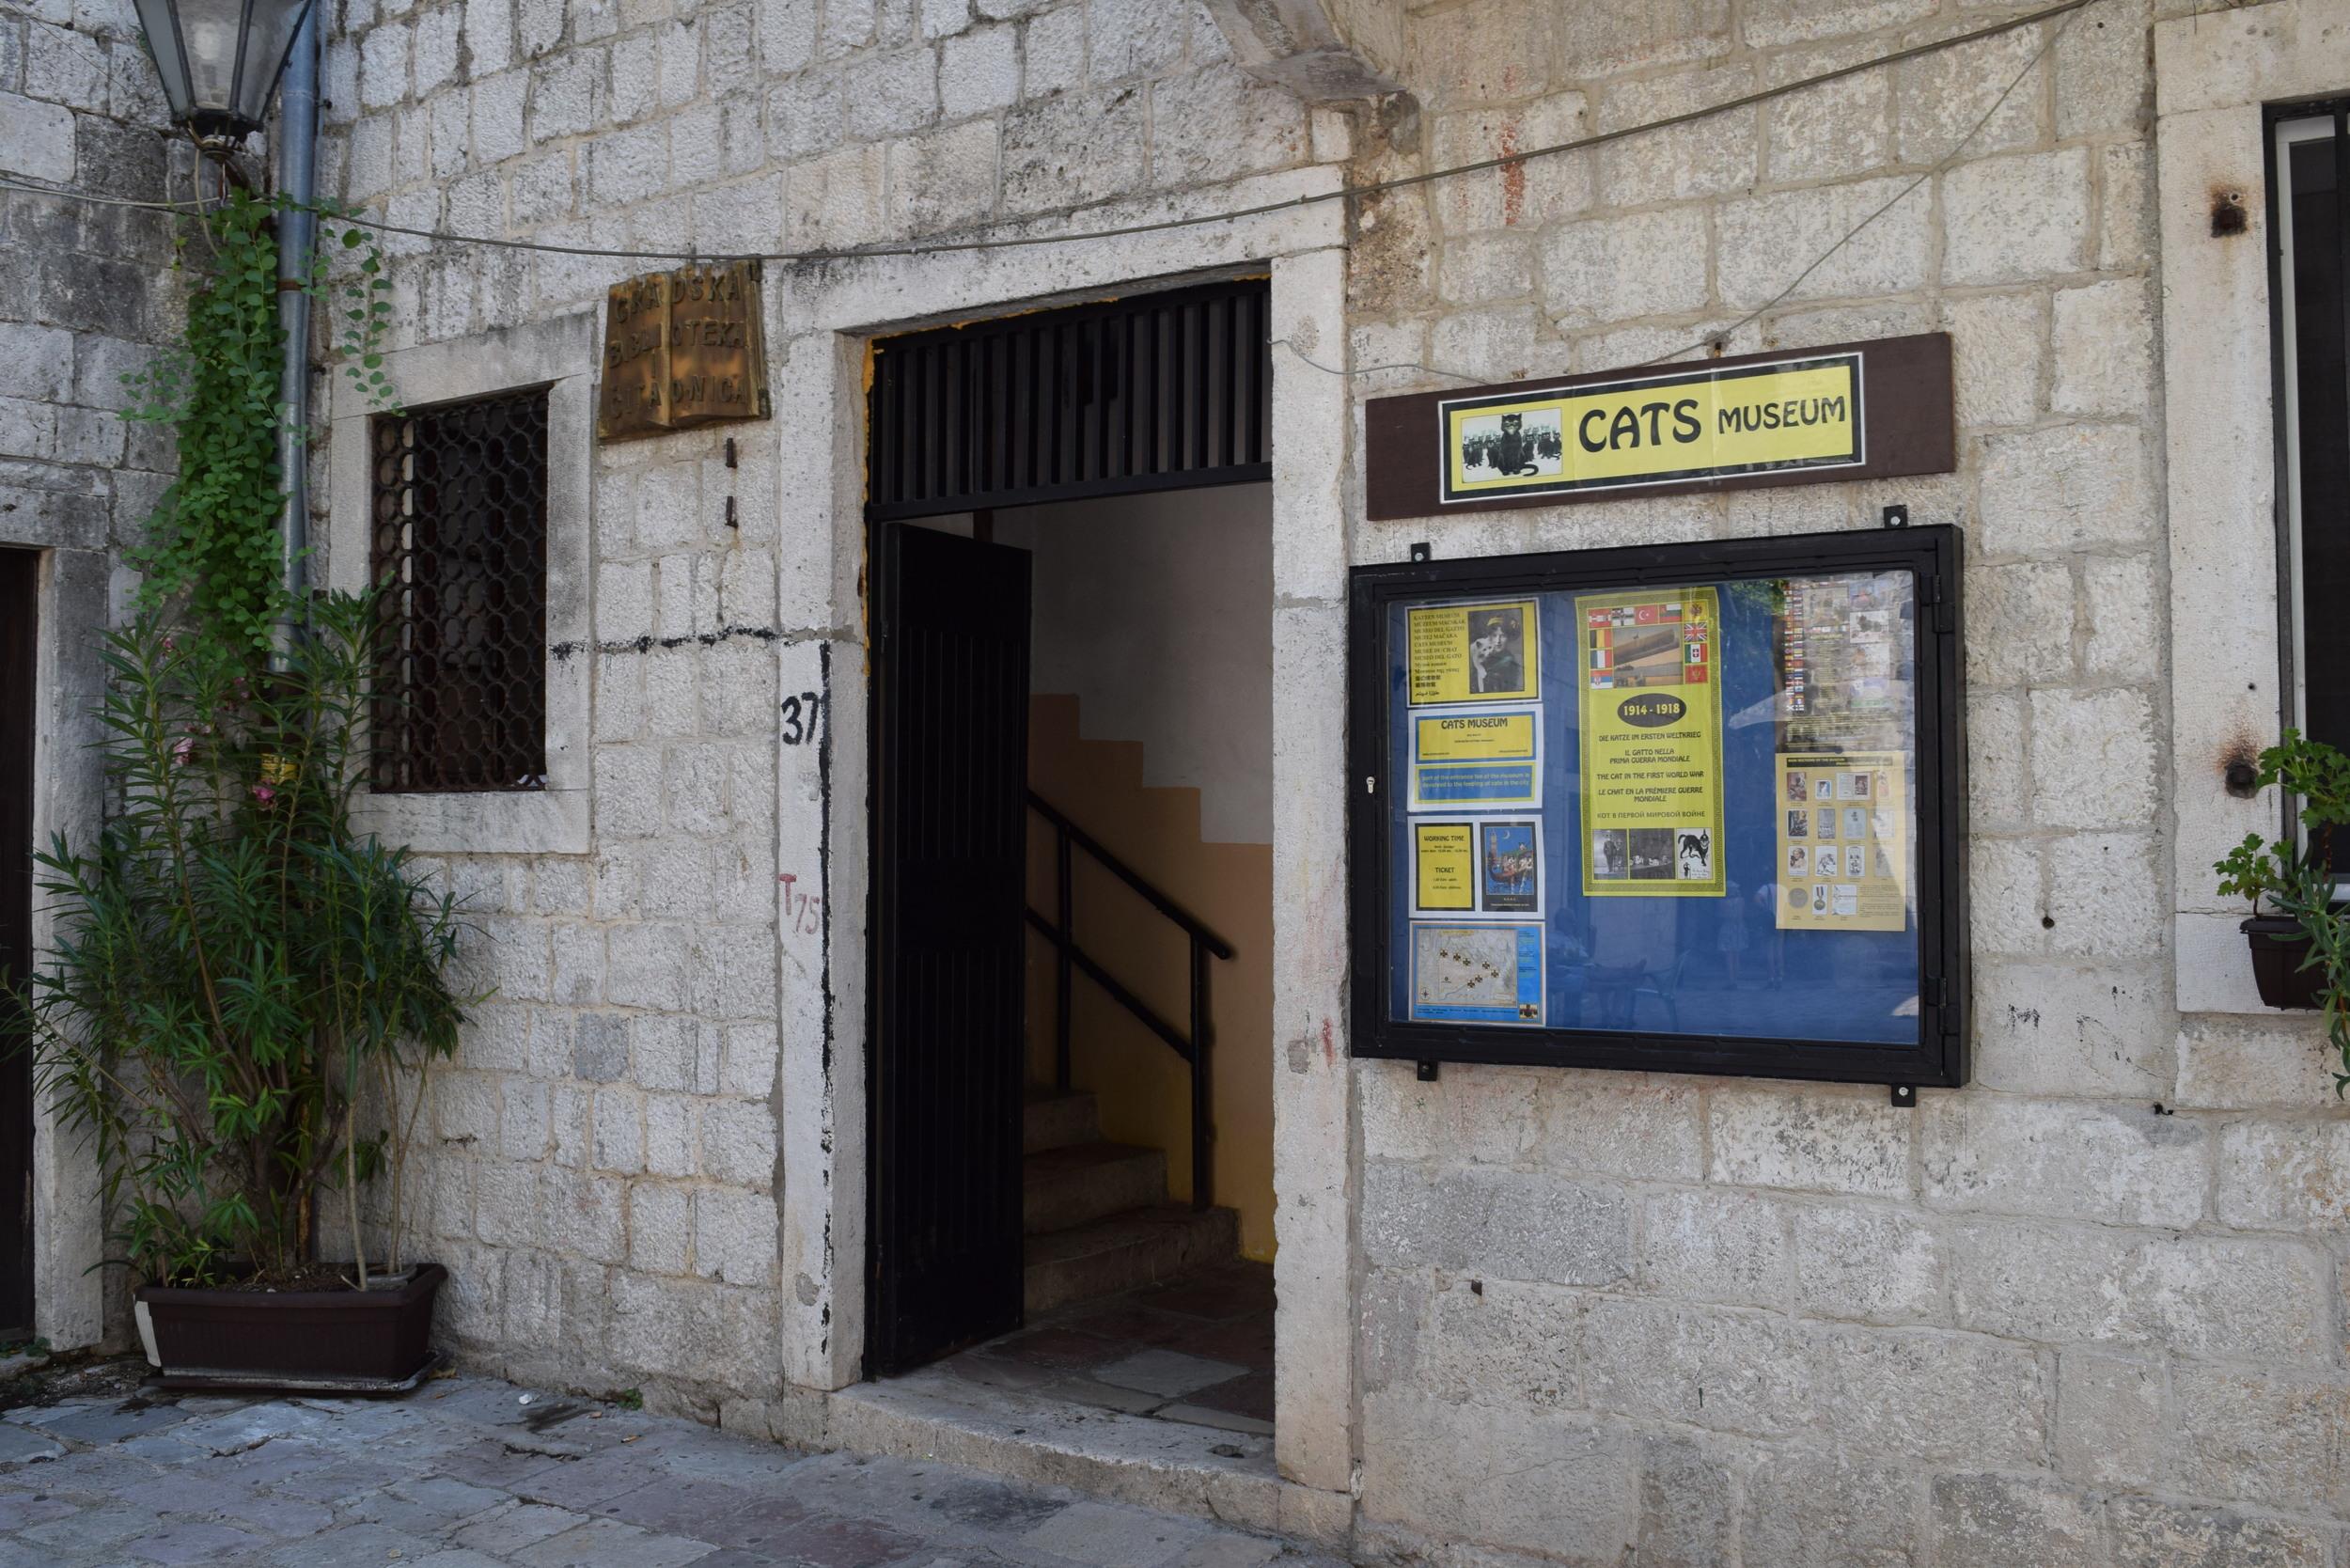 Kotor's Cats Museum